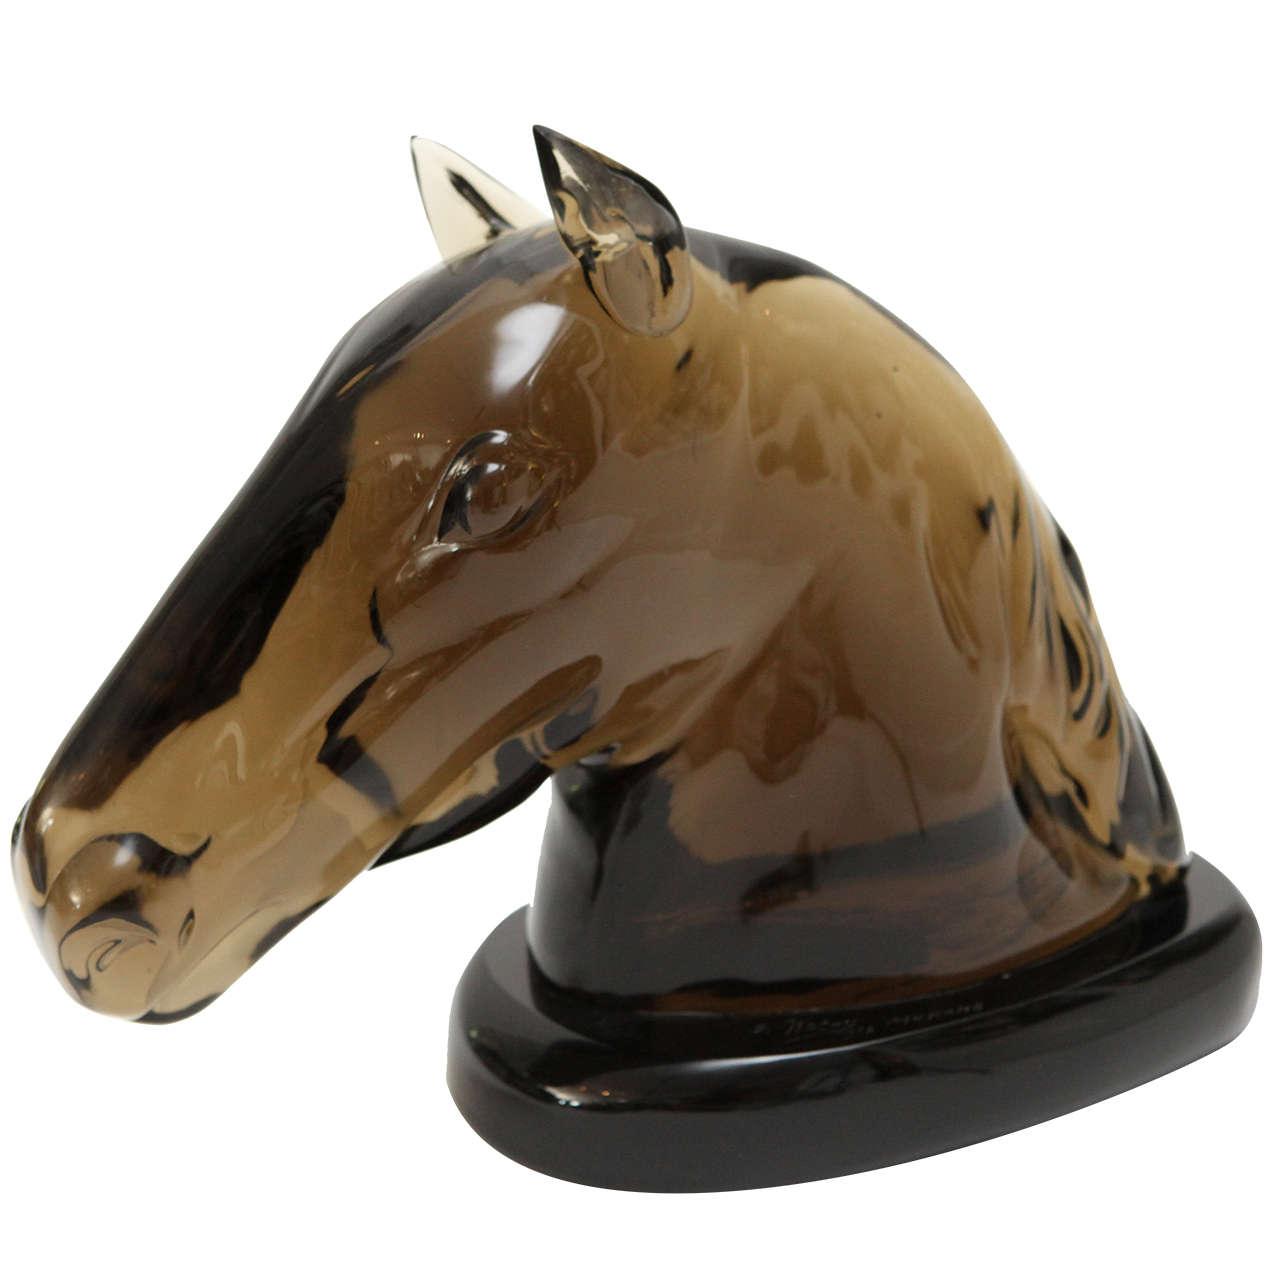 Murano Glass Sculpture by Ermanno Nason For Sale